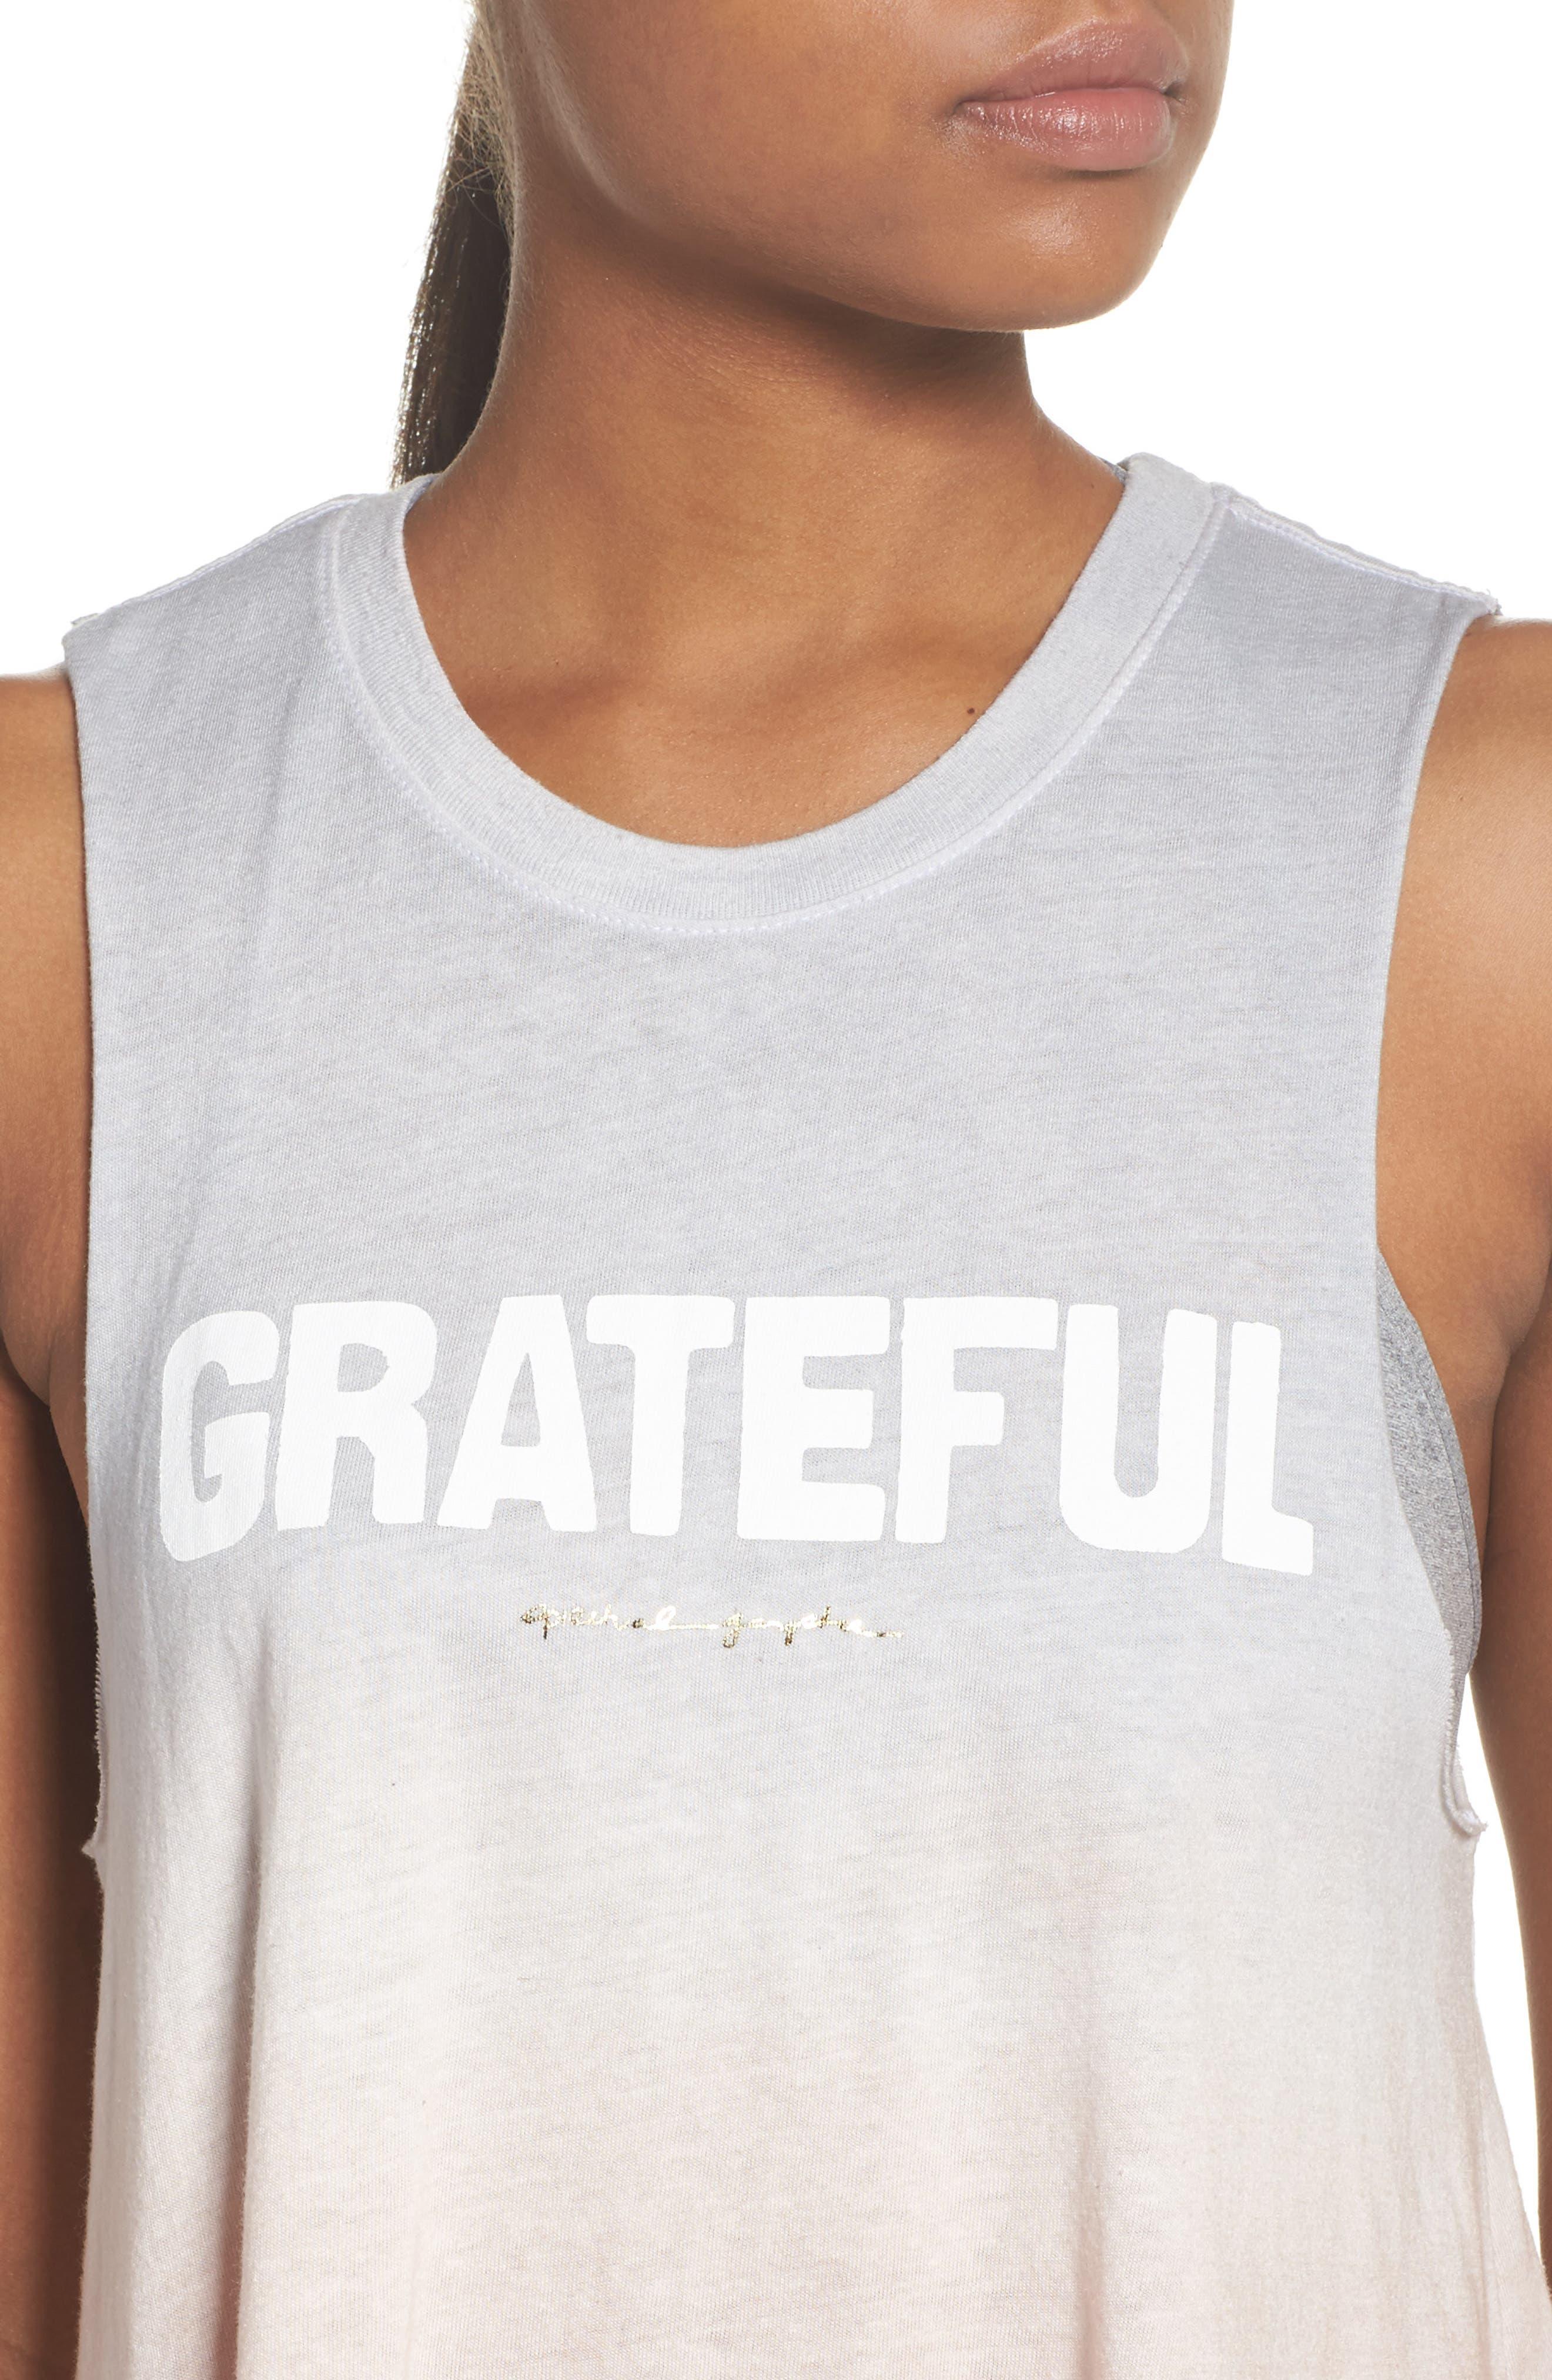 Grateful Graphic Tank,                             Alternate thumbnail 4, color,                             Sunset